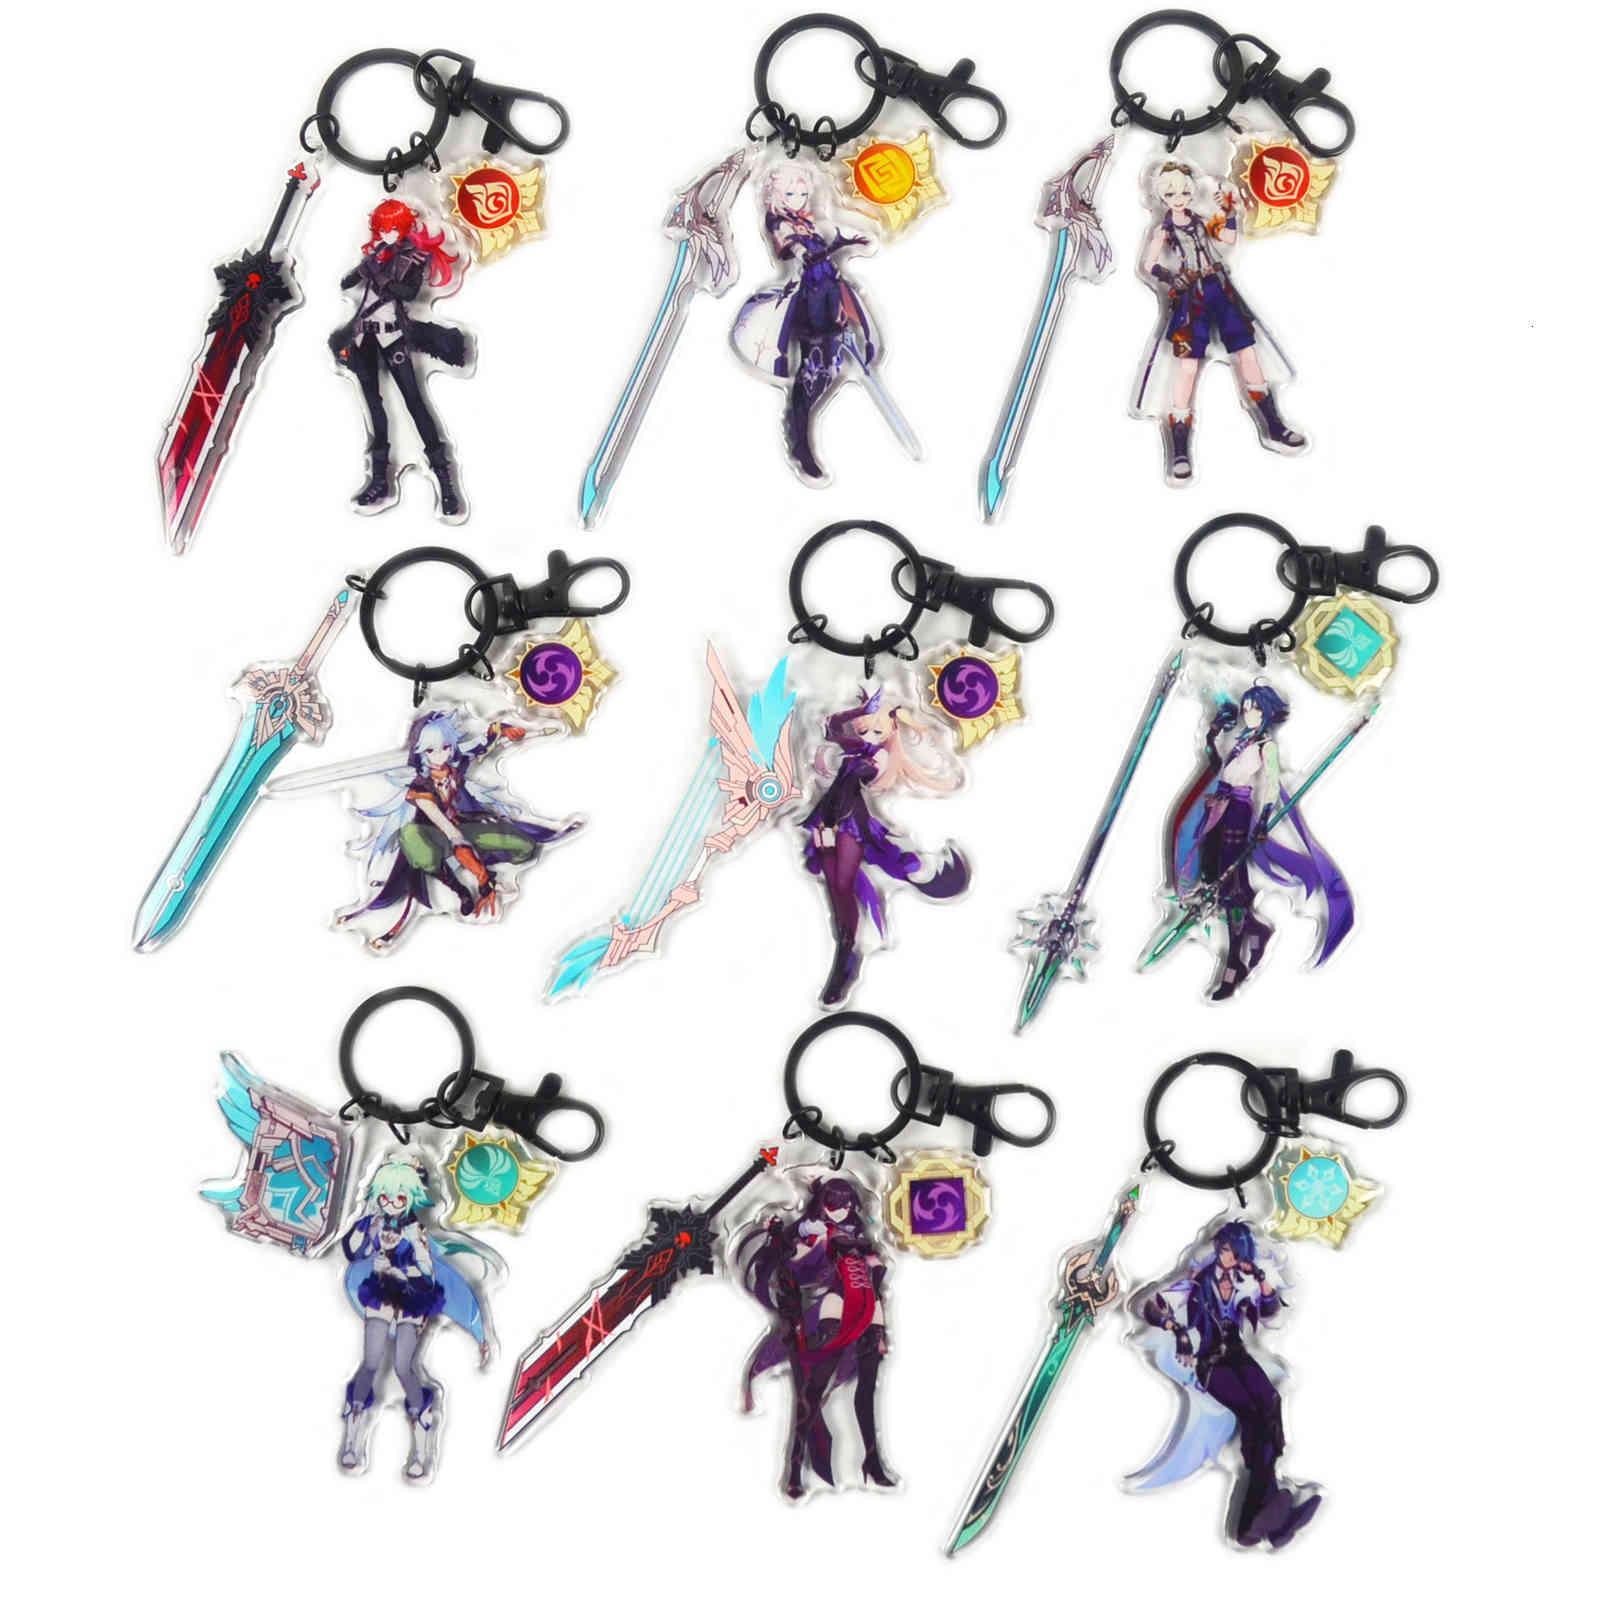 Cartoon keychains Genshin Impact Eye of God Acrylic Keychain Anima Game Zhong Li Peripheral Key Chain Cute Pendant Accessories Keyring